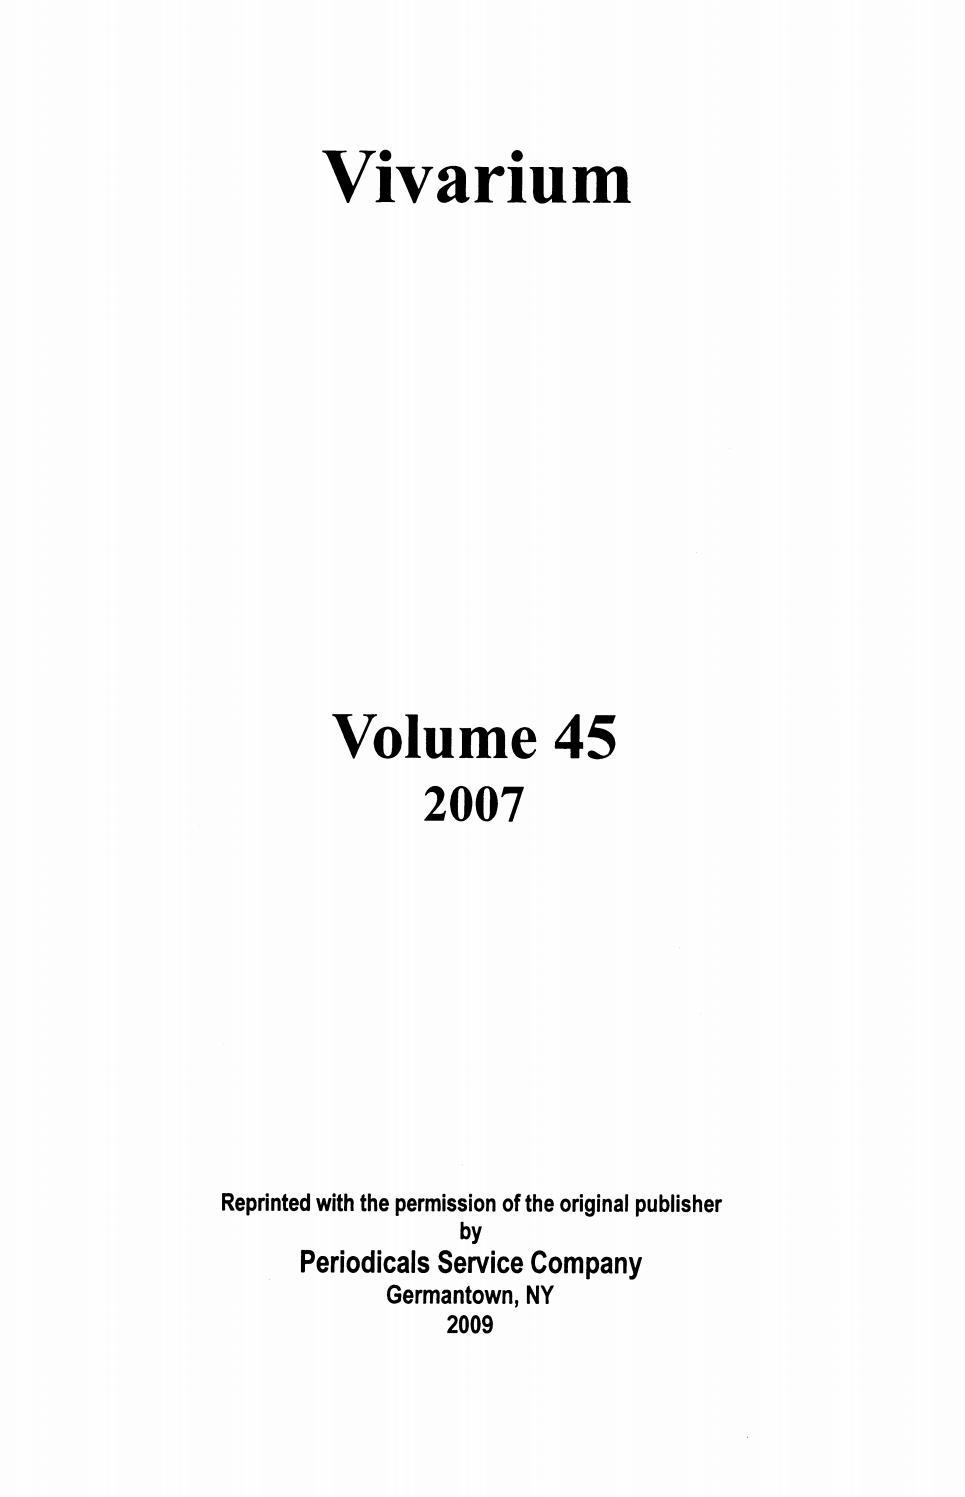 Vivarium Vol 45, Nos 1 2, 2007 By Uomodellarinascita - Issuu encequiconcerne Rébus Facile Avec Réponse